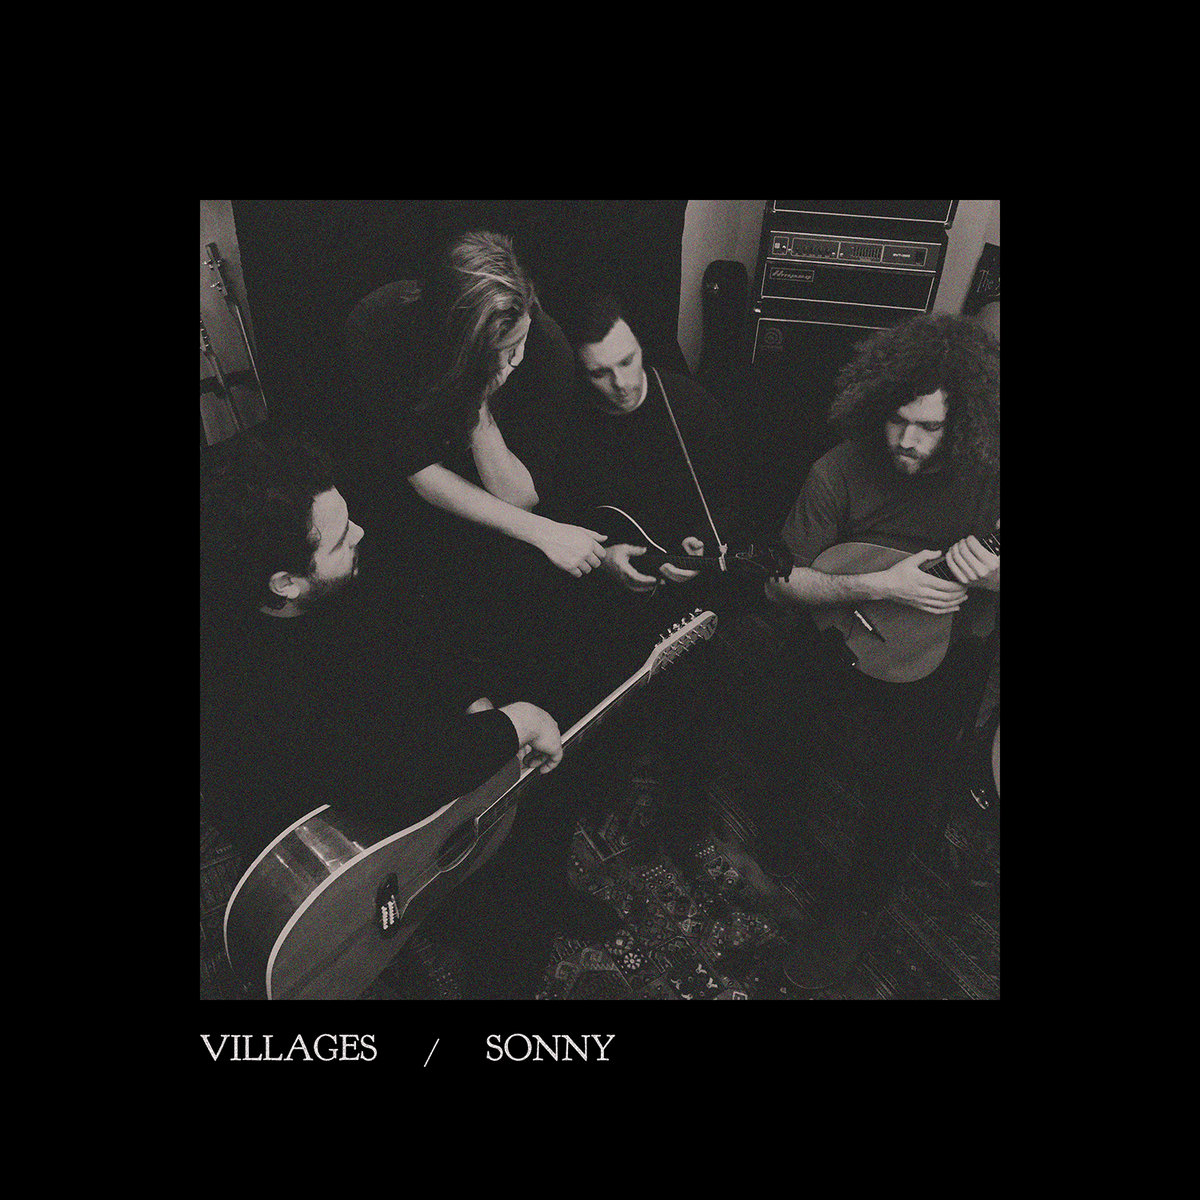 villages_sonny.jpg